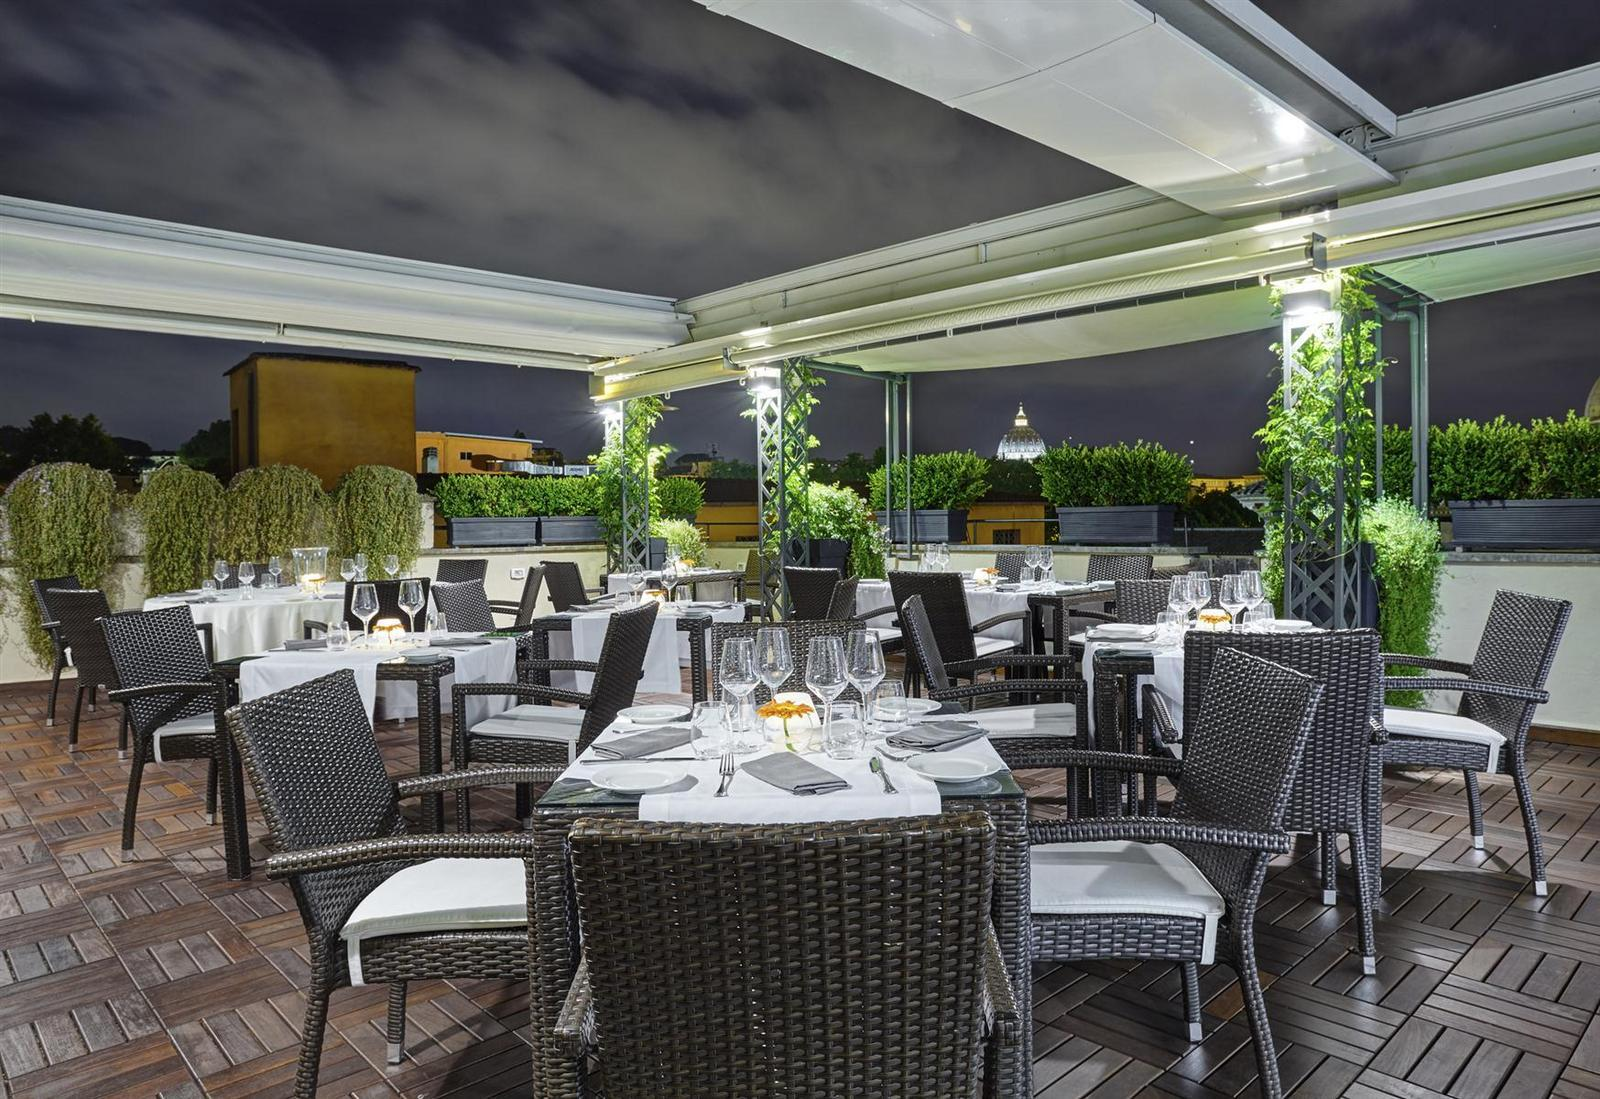 sofa lounge cafe amman menu console table modern mirror design roof terrace